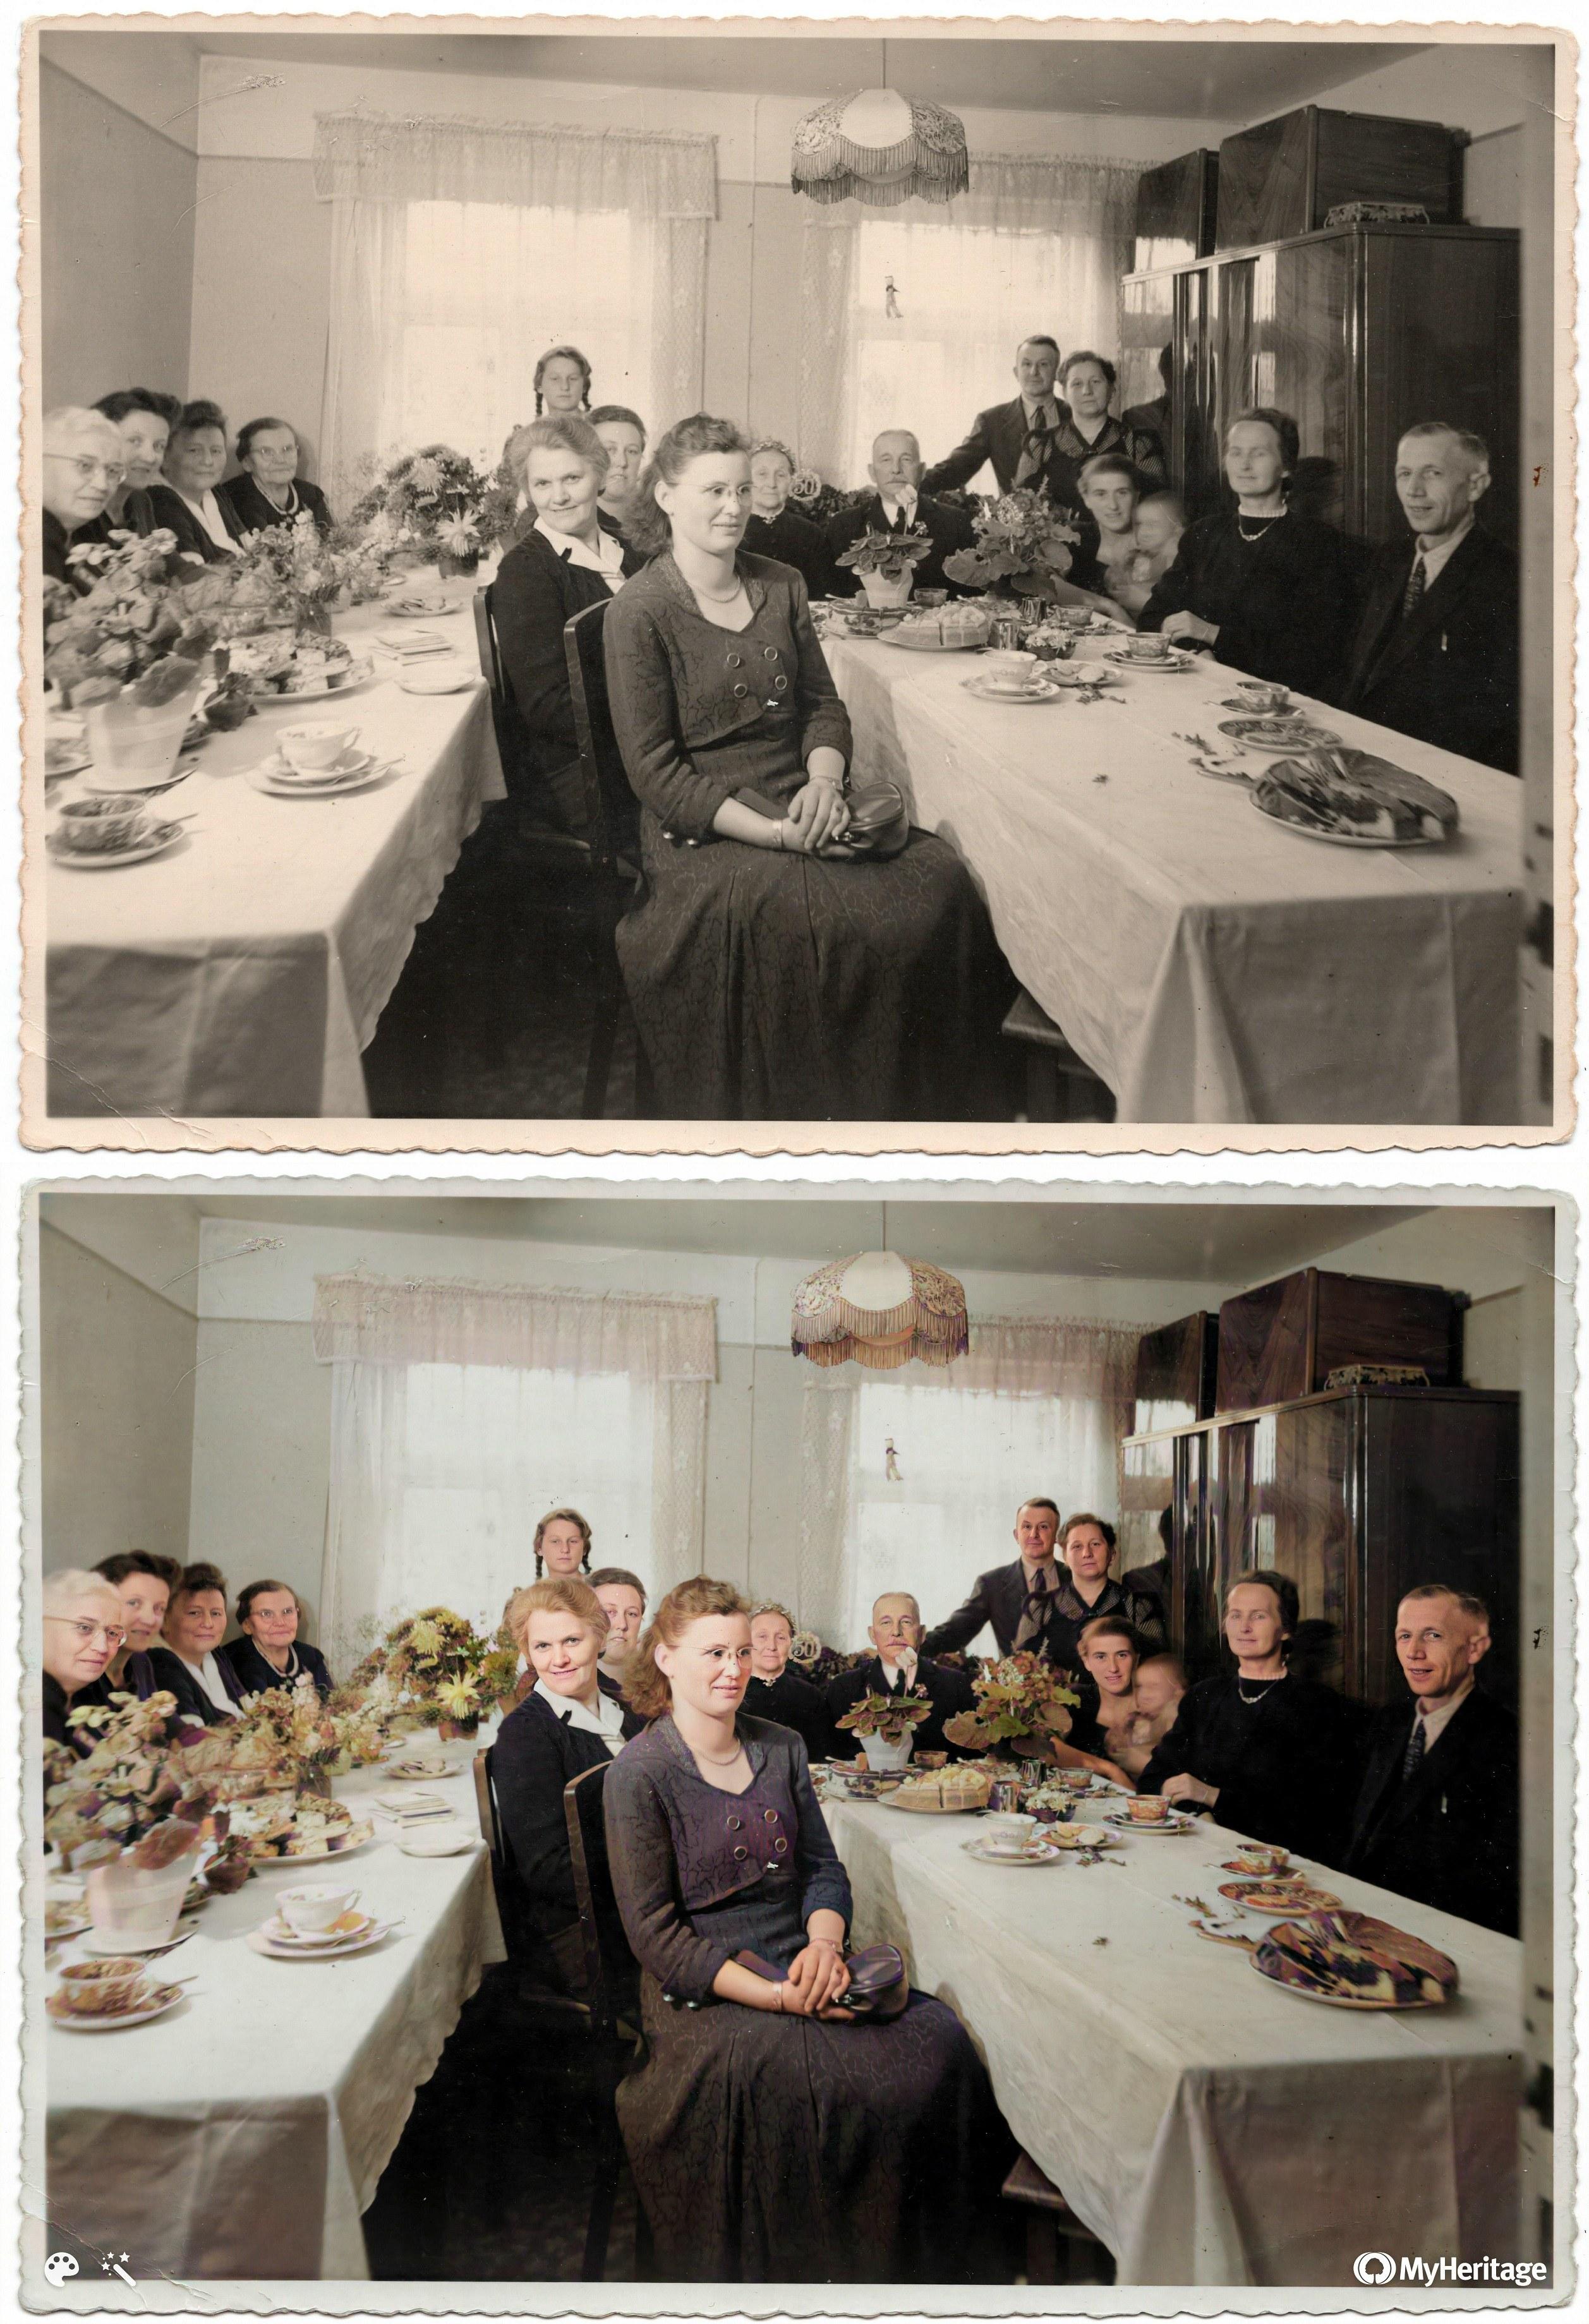 photo500102-comparison-scaled.jpg